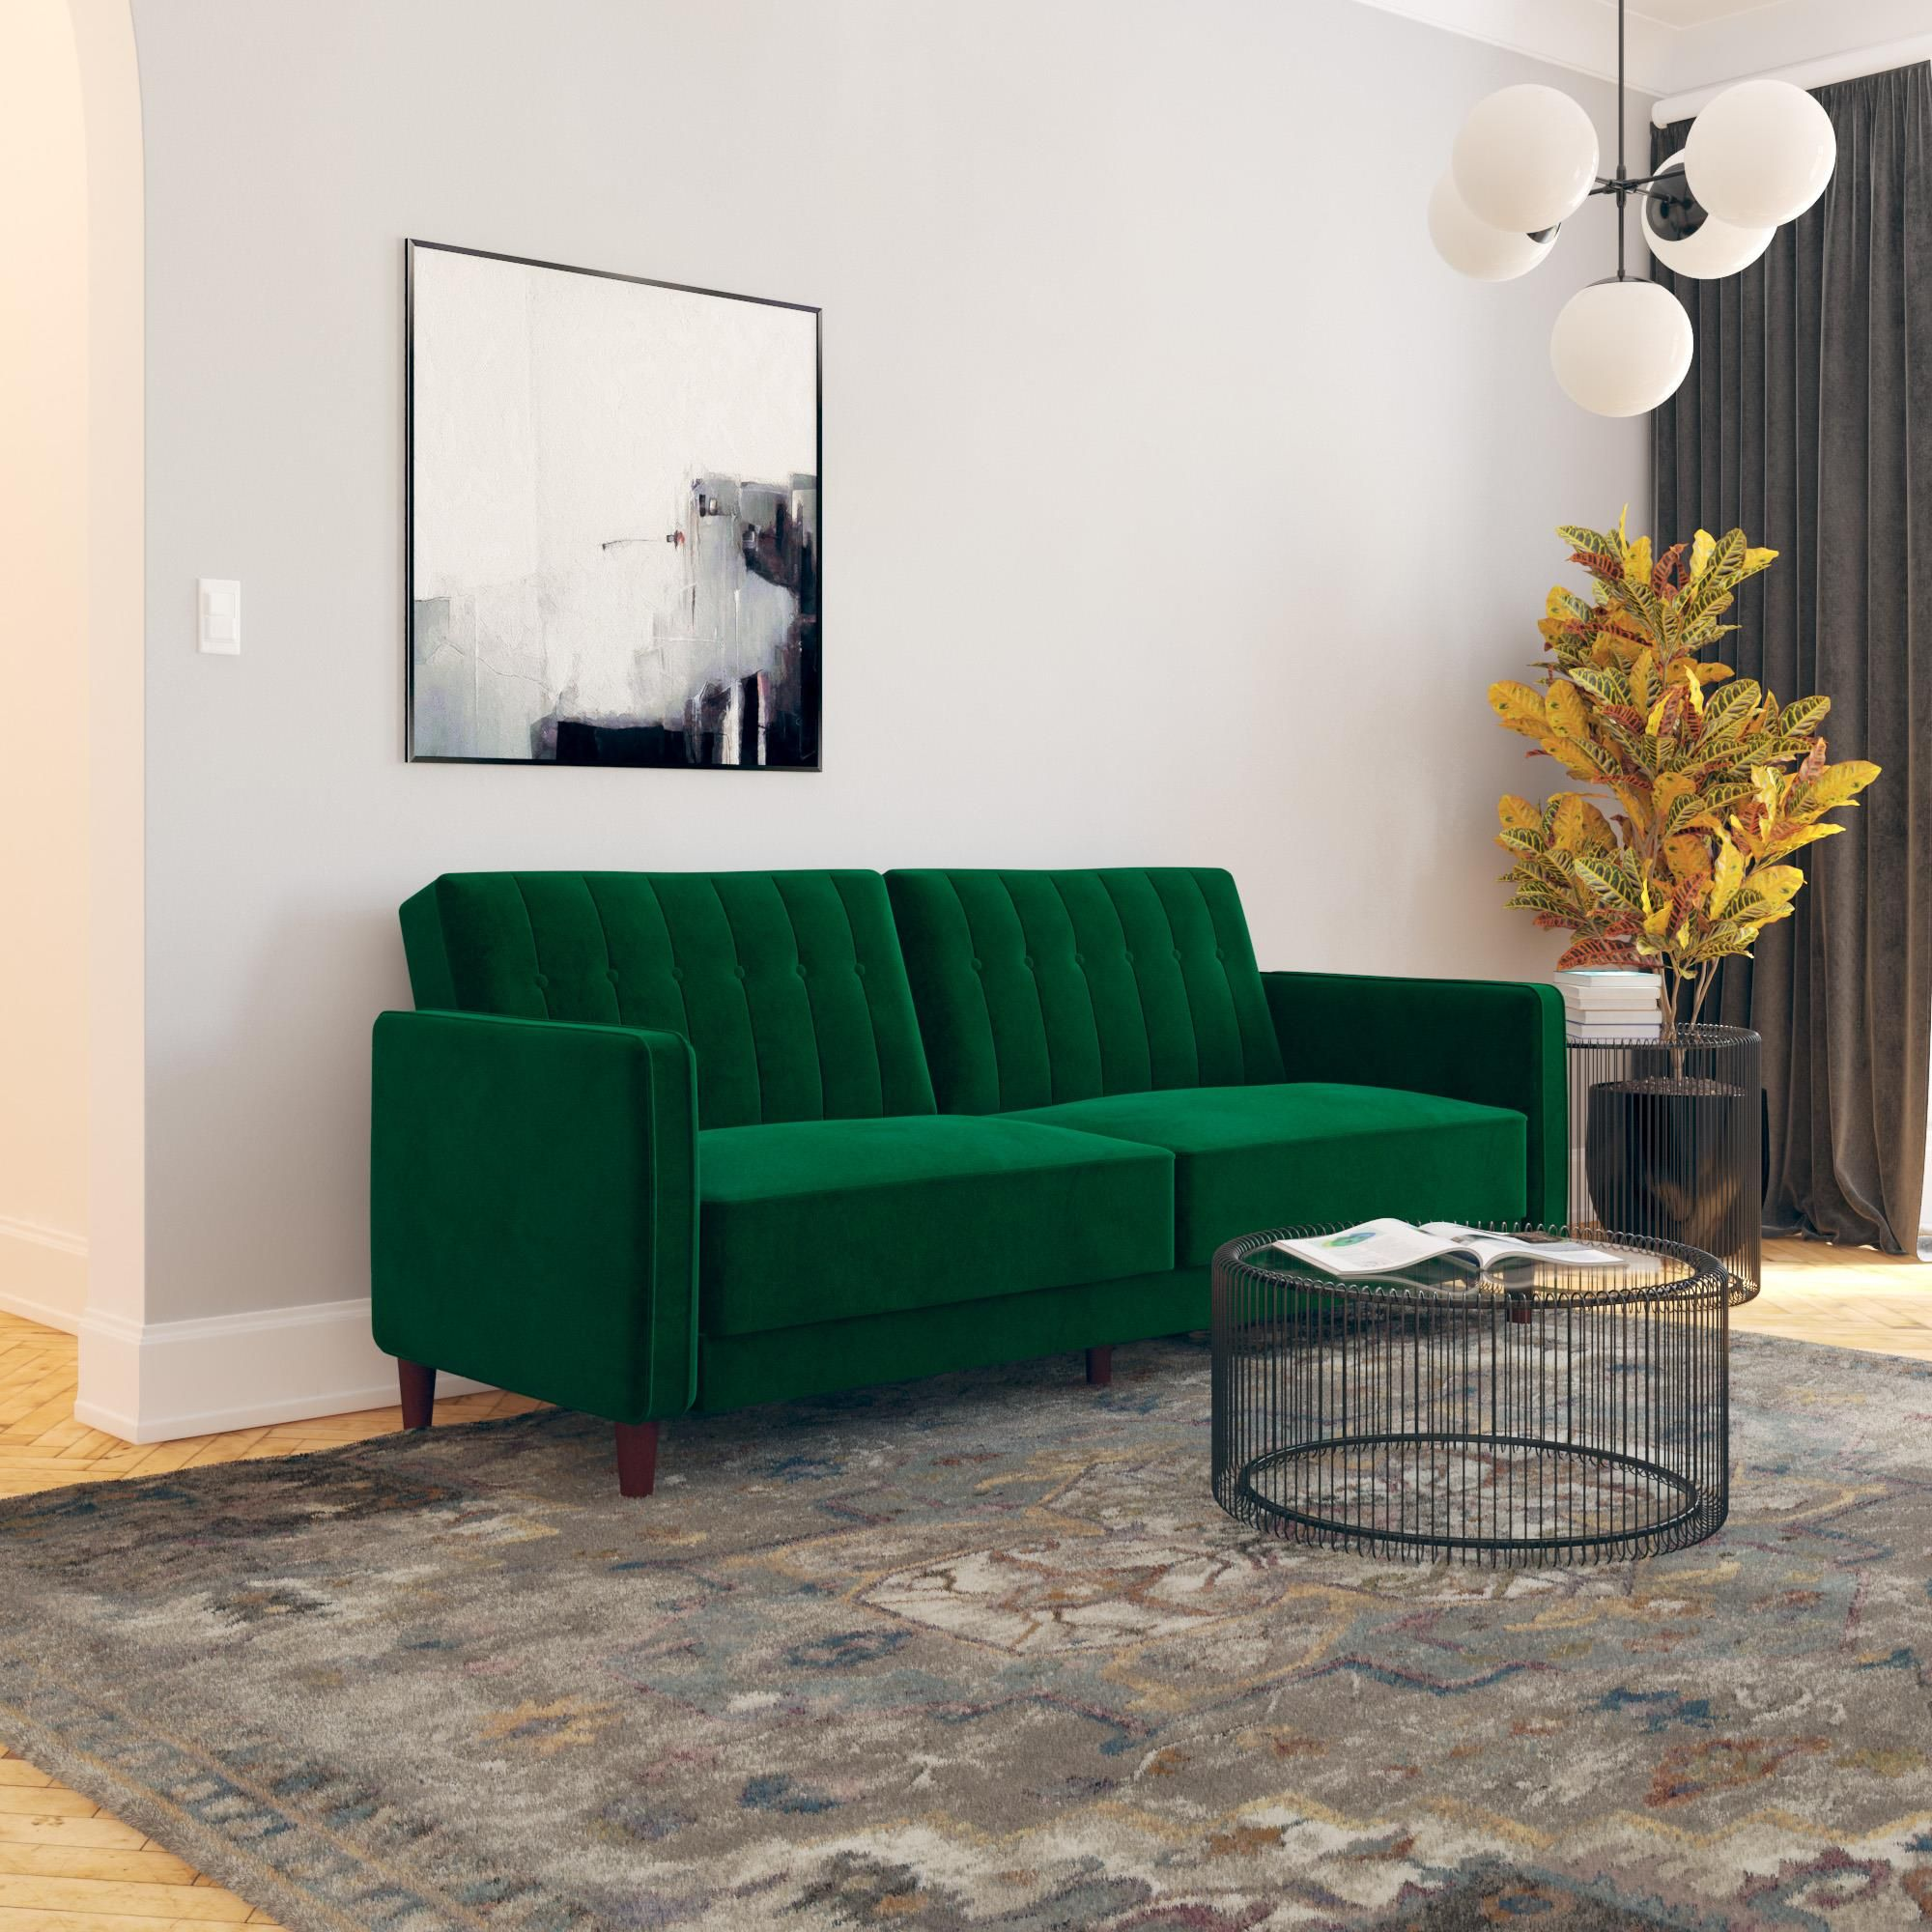 Home Tufted Sofa Living Room Decor Furniture